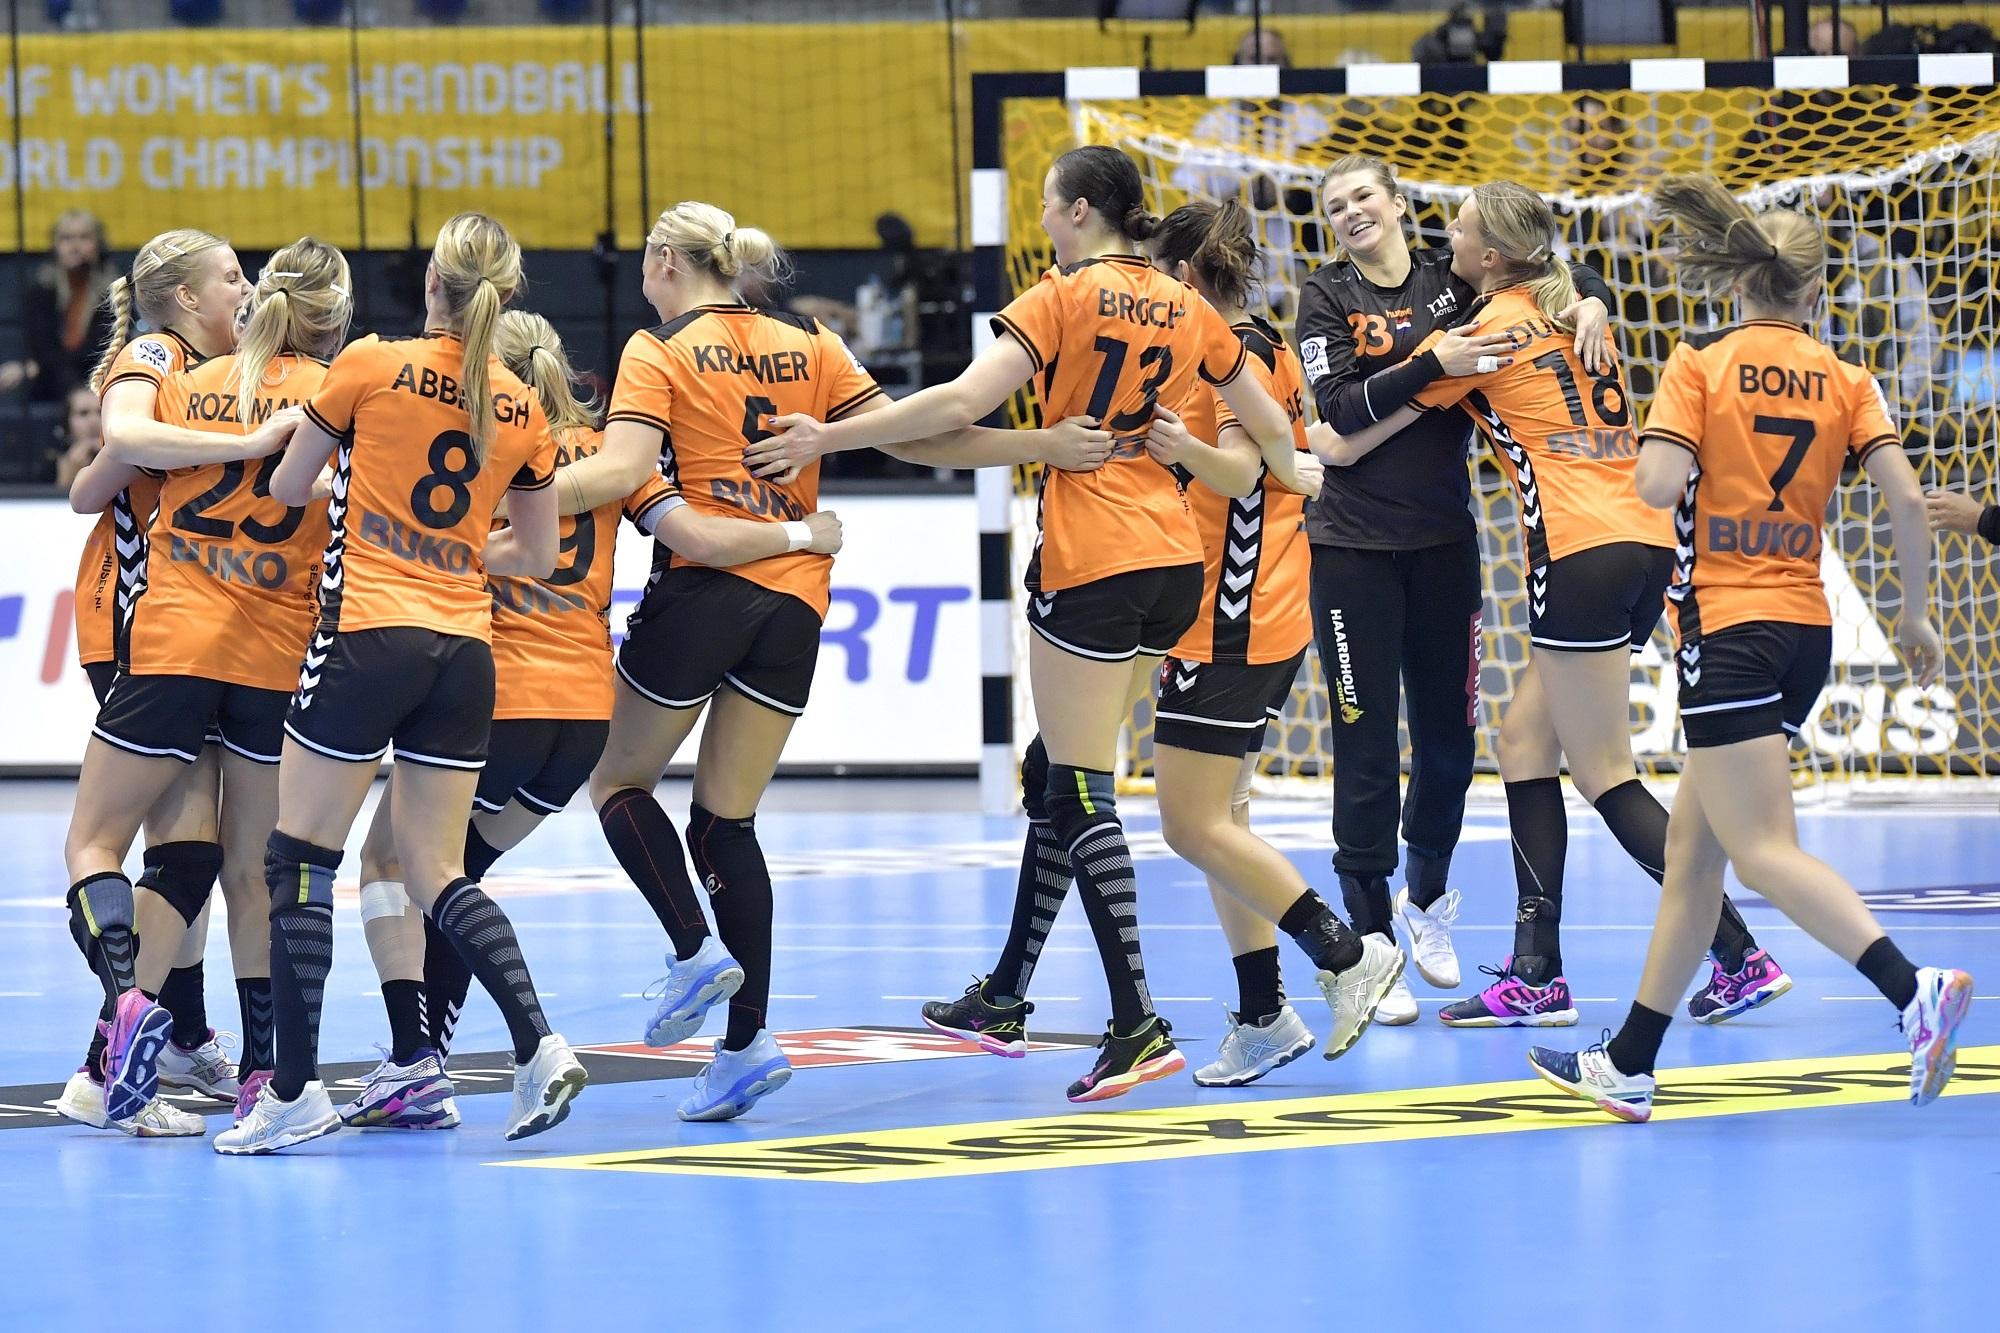 13-12-2017 HANDBAL:NEDERLAND-TSJECHIE:MAGDEBURG WK Handbal Dames 2017 1/4 Finales, Nederland - Tsjechie 30-26 Feest Na Afloop  Foto: Henk Seppen